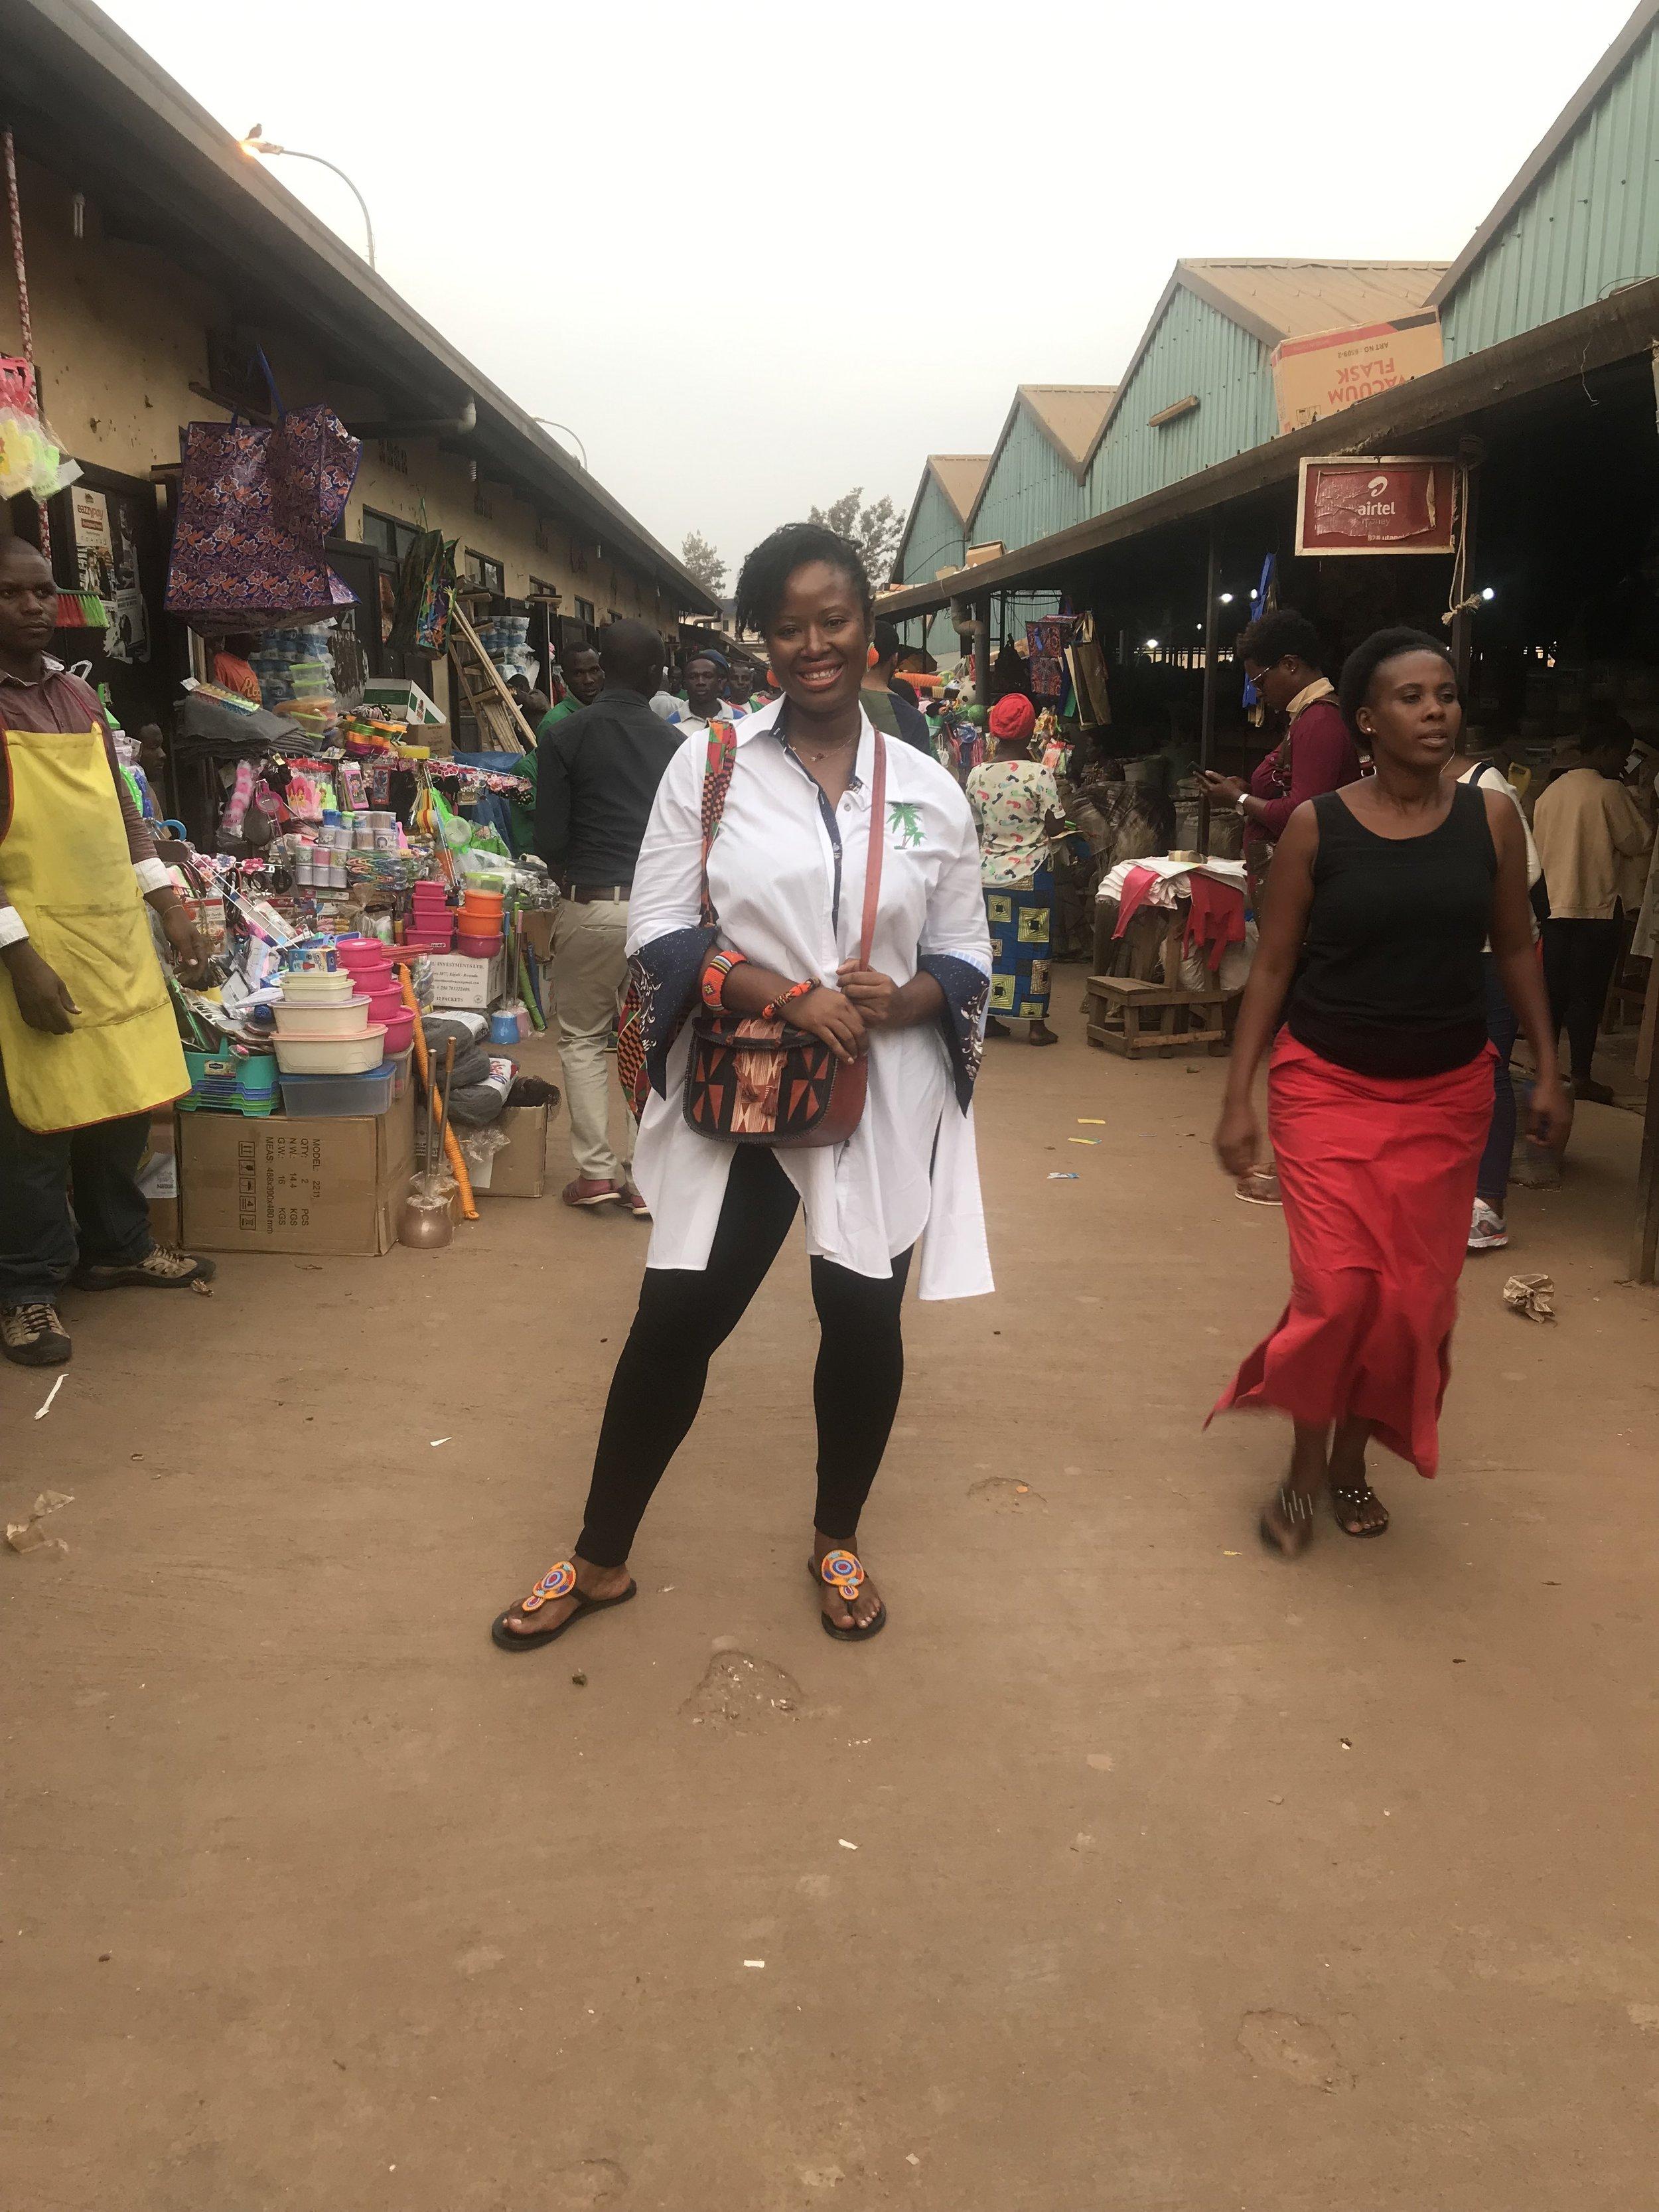 IMG_6197 2VickieRemoe-travel-kigali-rwanda-review-kwibohora25-hotels-africa.JPG